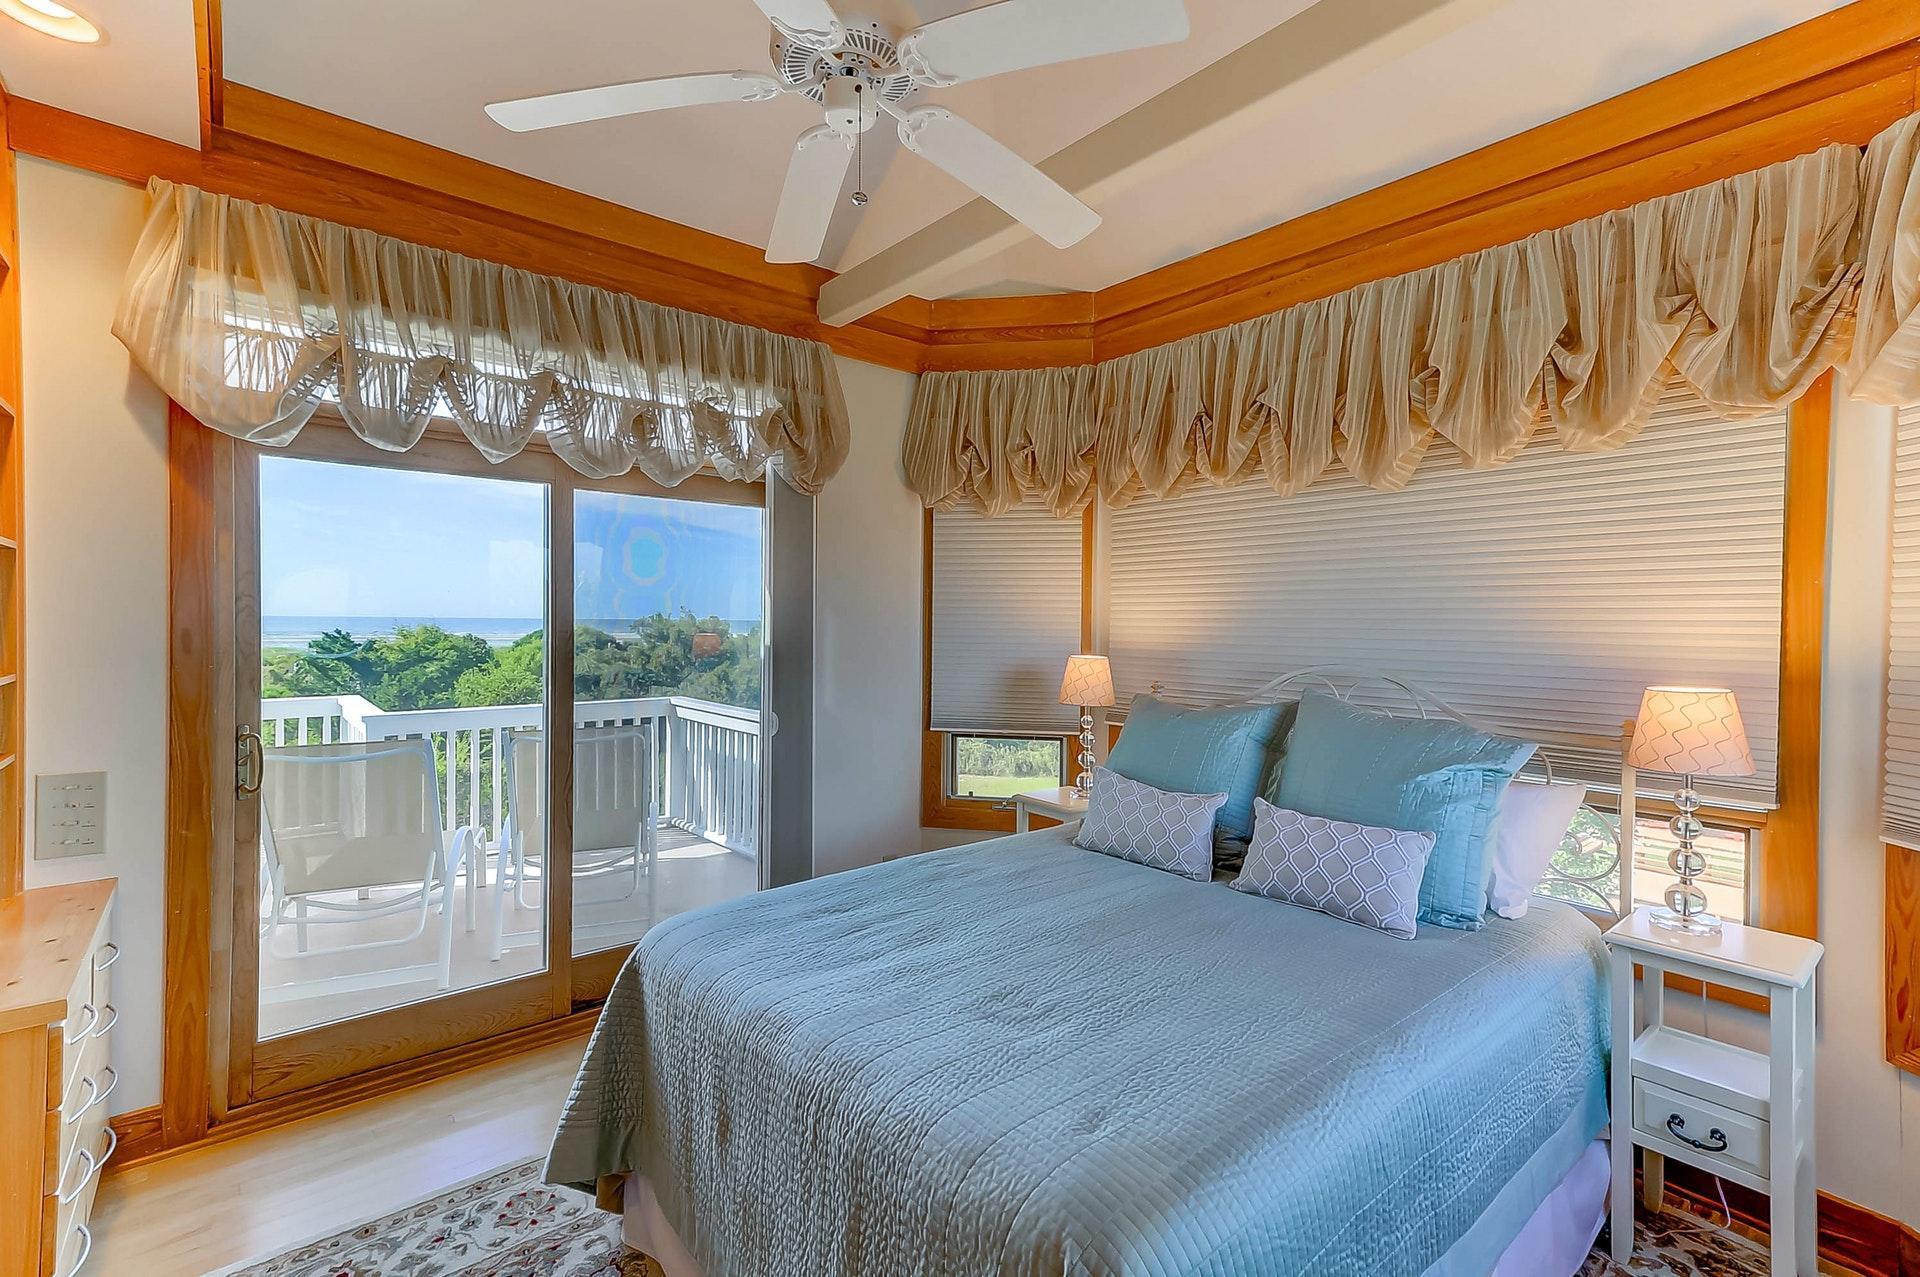 Photo of 2723 Bayonne St, Sullivan's Island, SC 29482